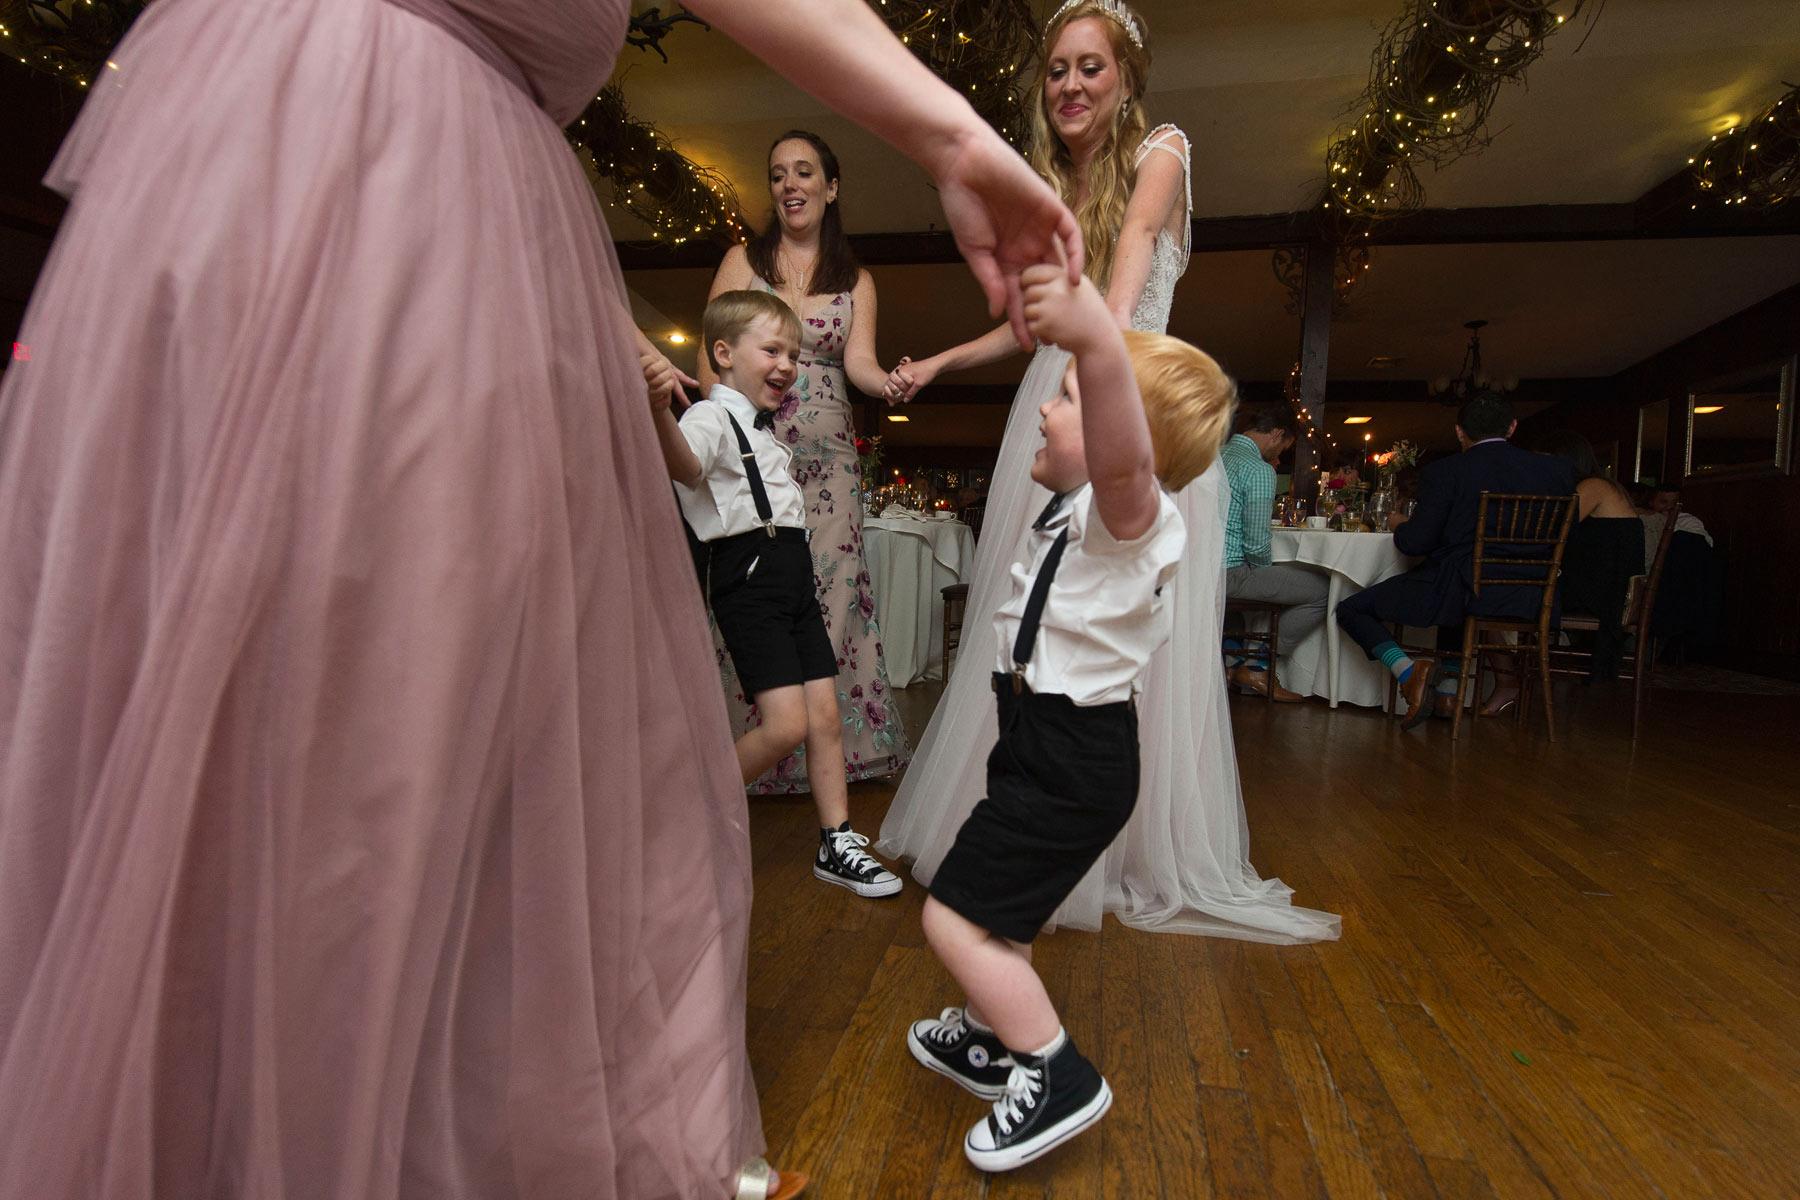 Bucks_County_wedding_photographer_Stroudsmoor_country_inn_wedding_Philadelphia_wedding_photographer_28_we_are_family.JPG